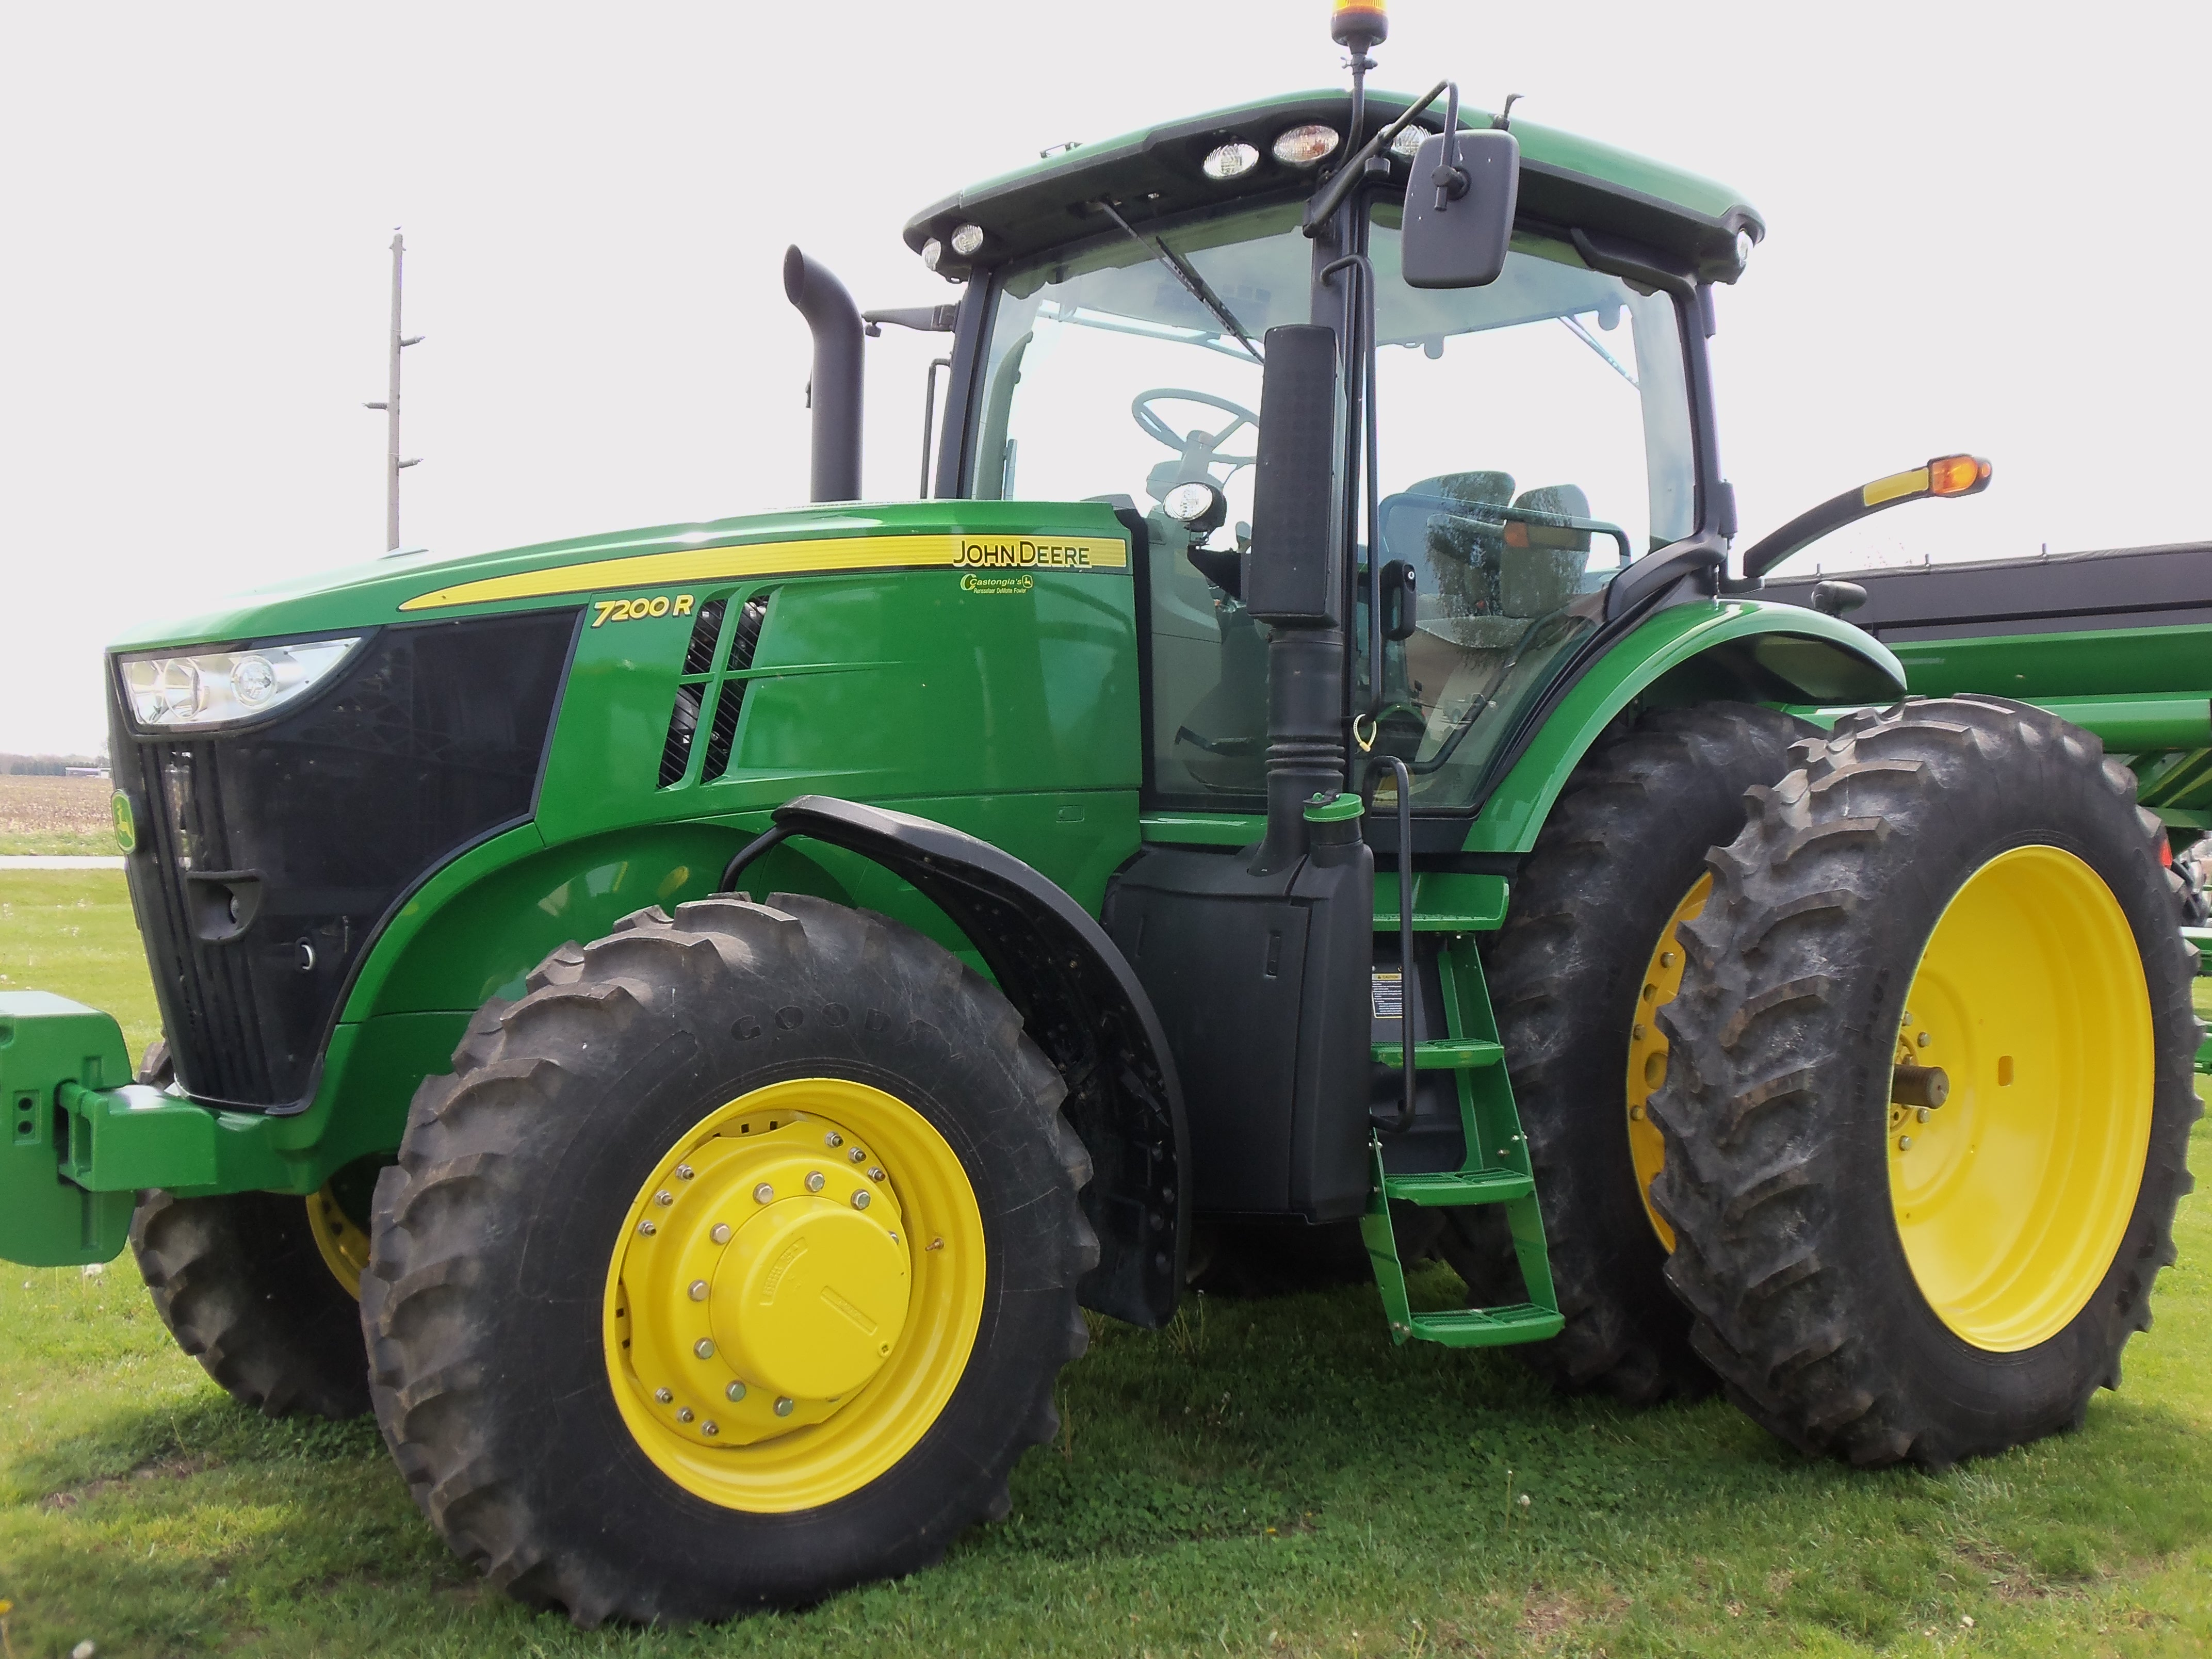 Large 7R Series tractor | John Deere equipment | Pinterest